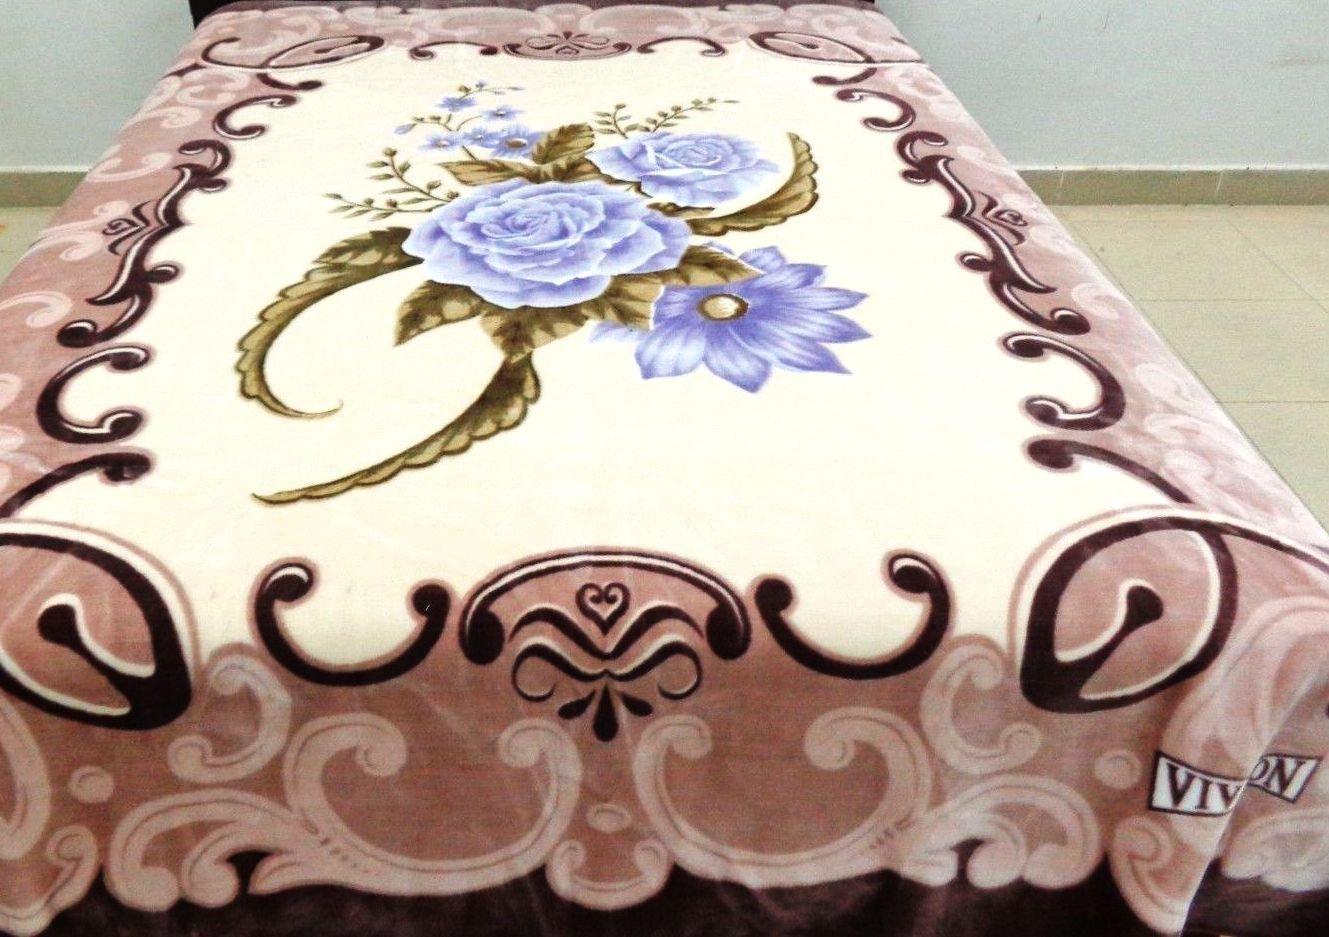 Vivalon Brown Roses (BM127) Thick Mink Plush Korean Style King Size Blanket - By Solaron